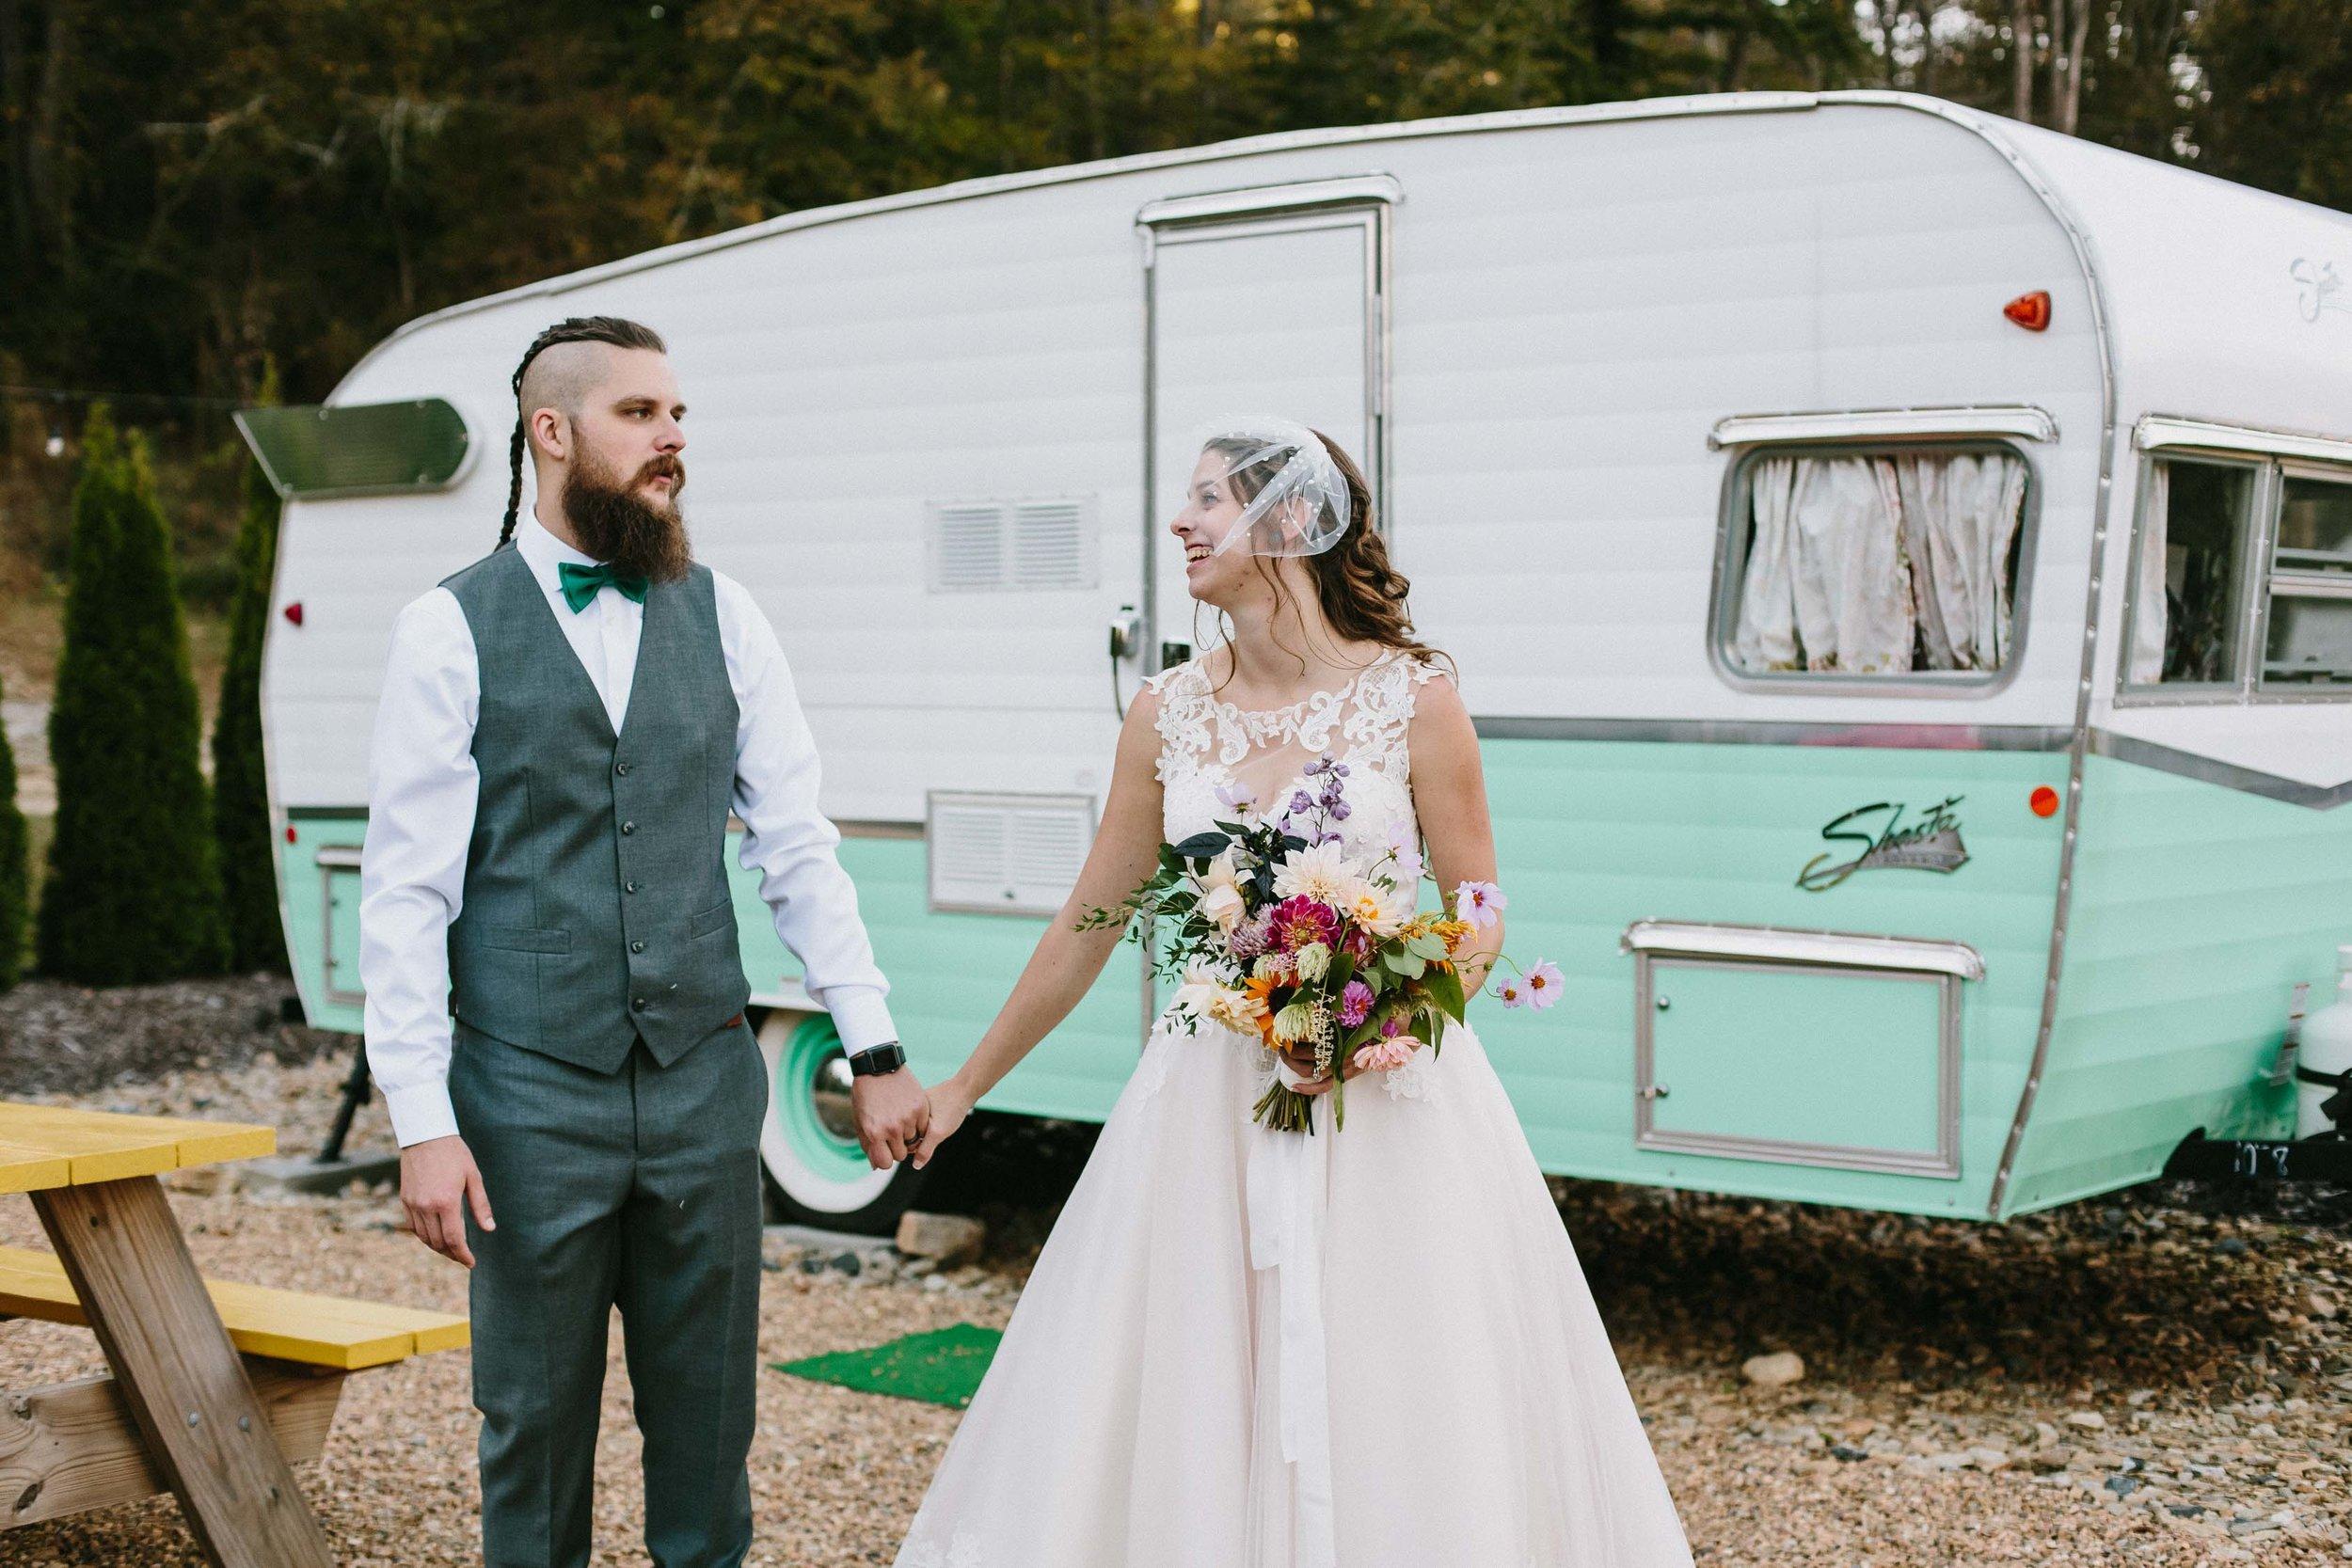 Angeli_Joe__Asheville_Wedding-70.jpg